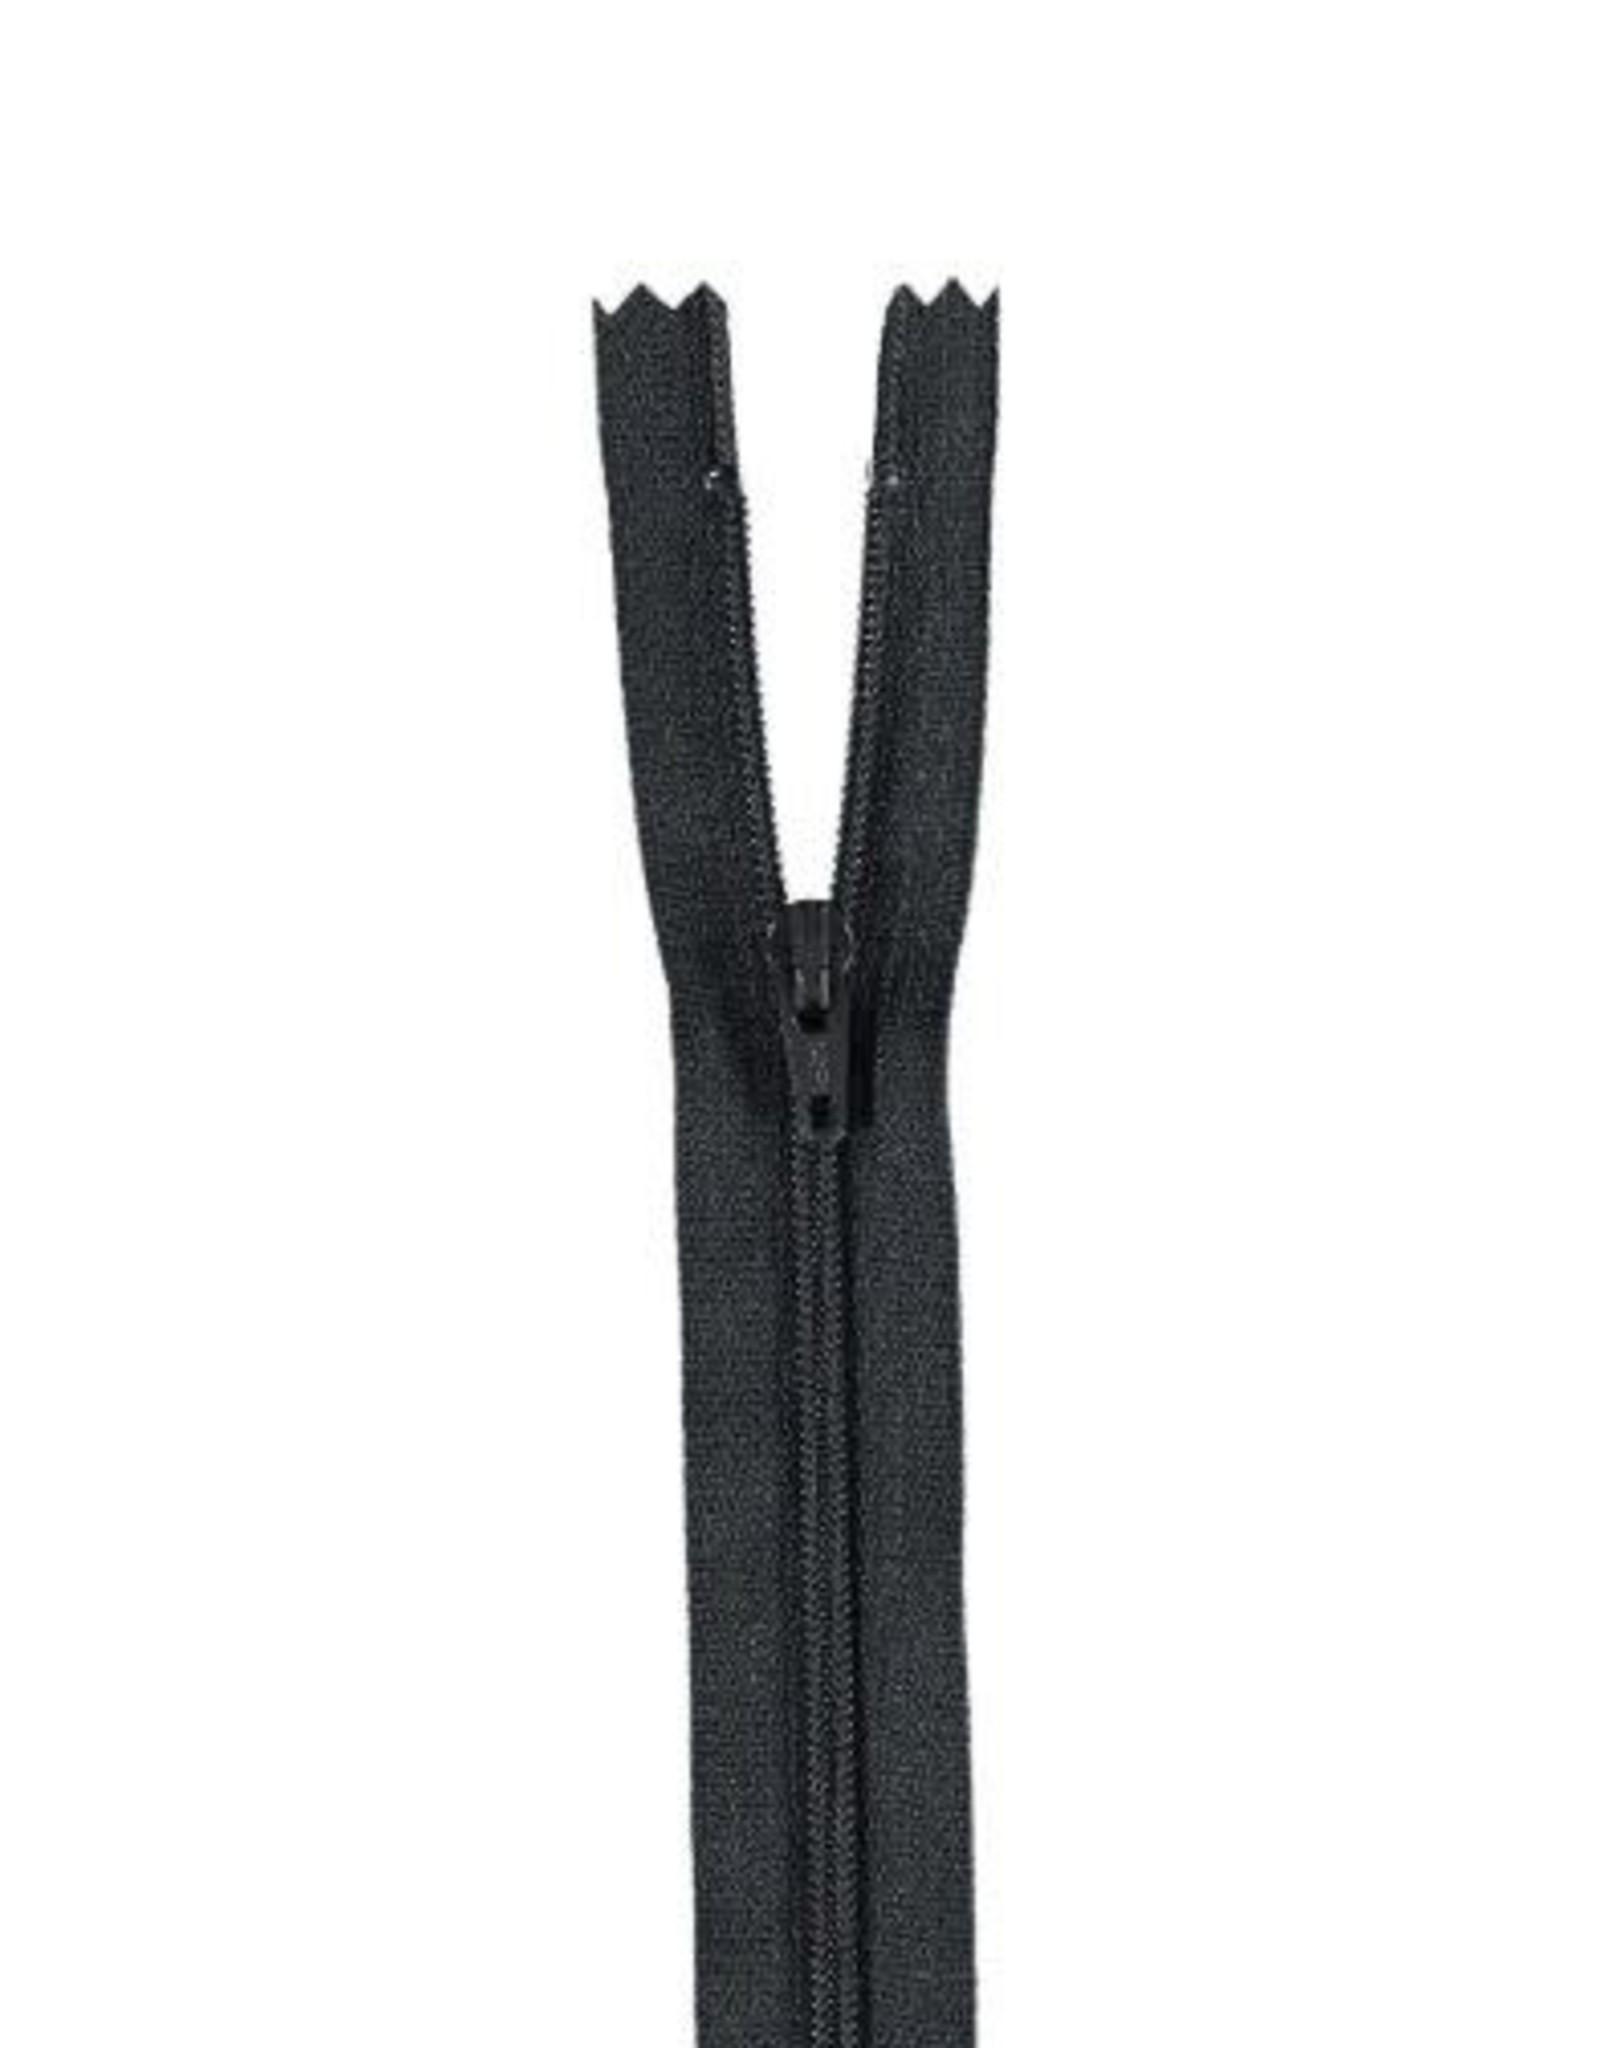 YKK Spiraalrits niet-DB 3mm antraciet 156-35cm